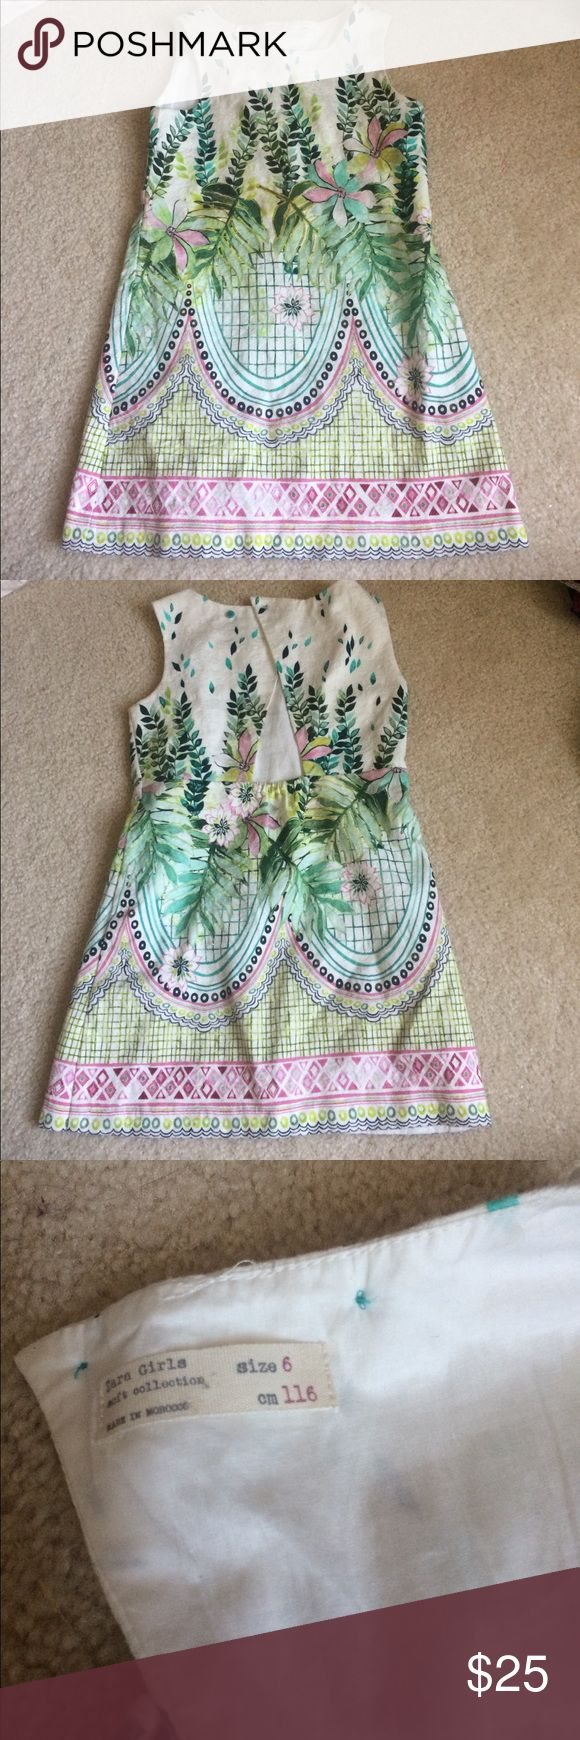 ADORABLE Zara Girls Dress Love love love this dress just too short on my daughter. Zara Dresses